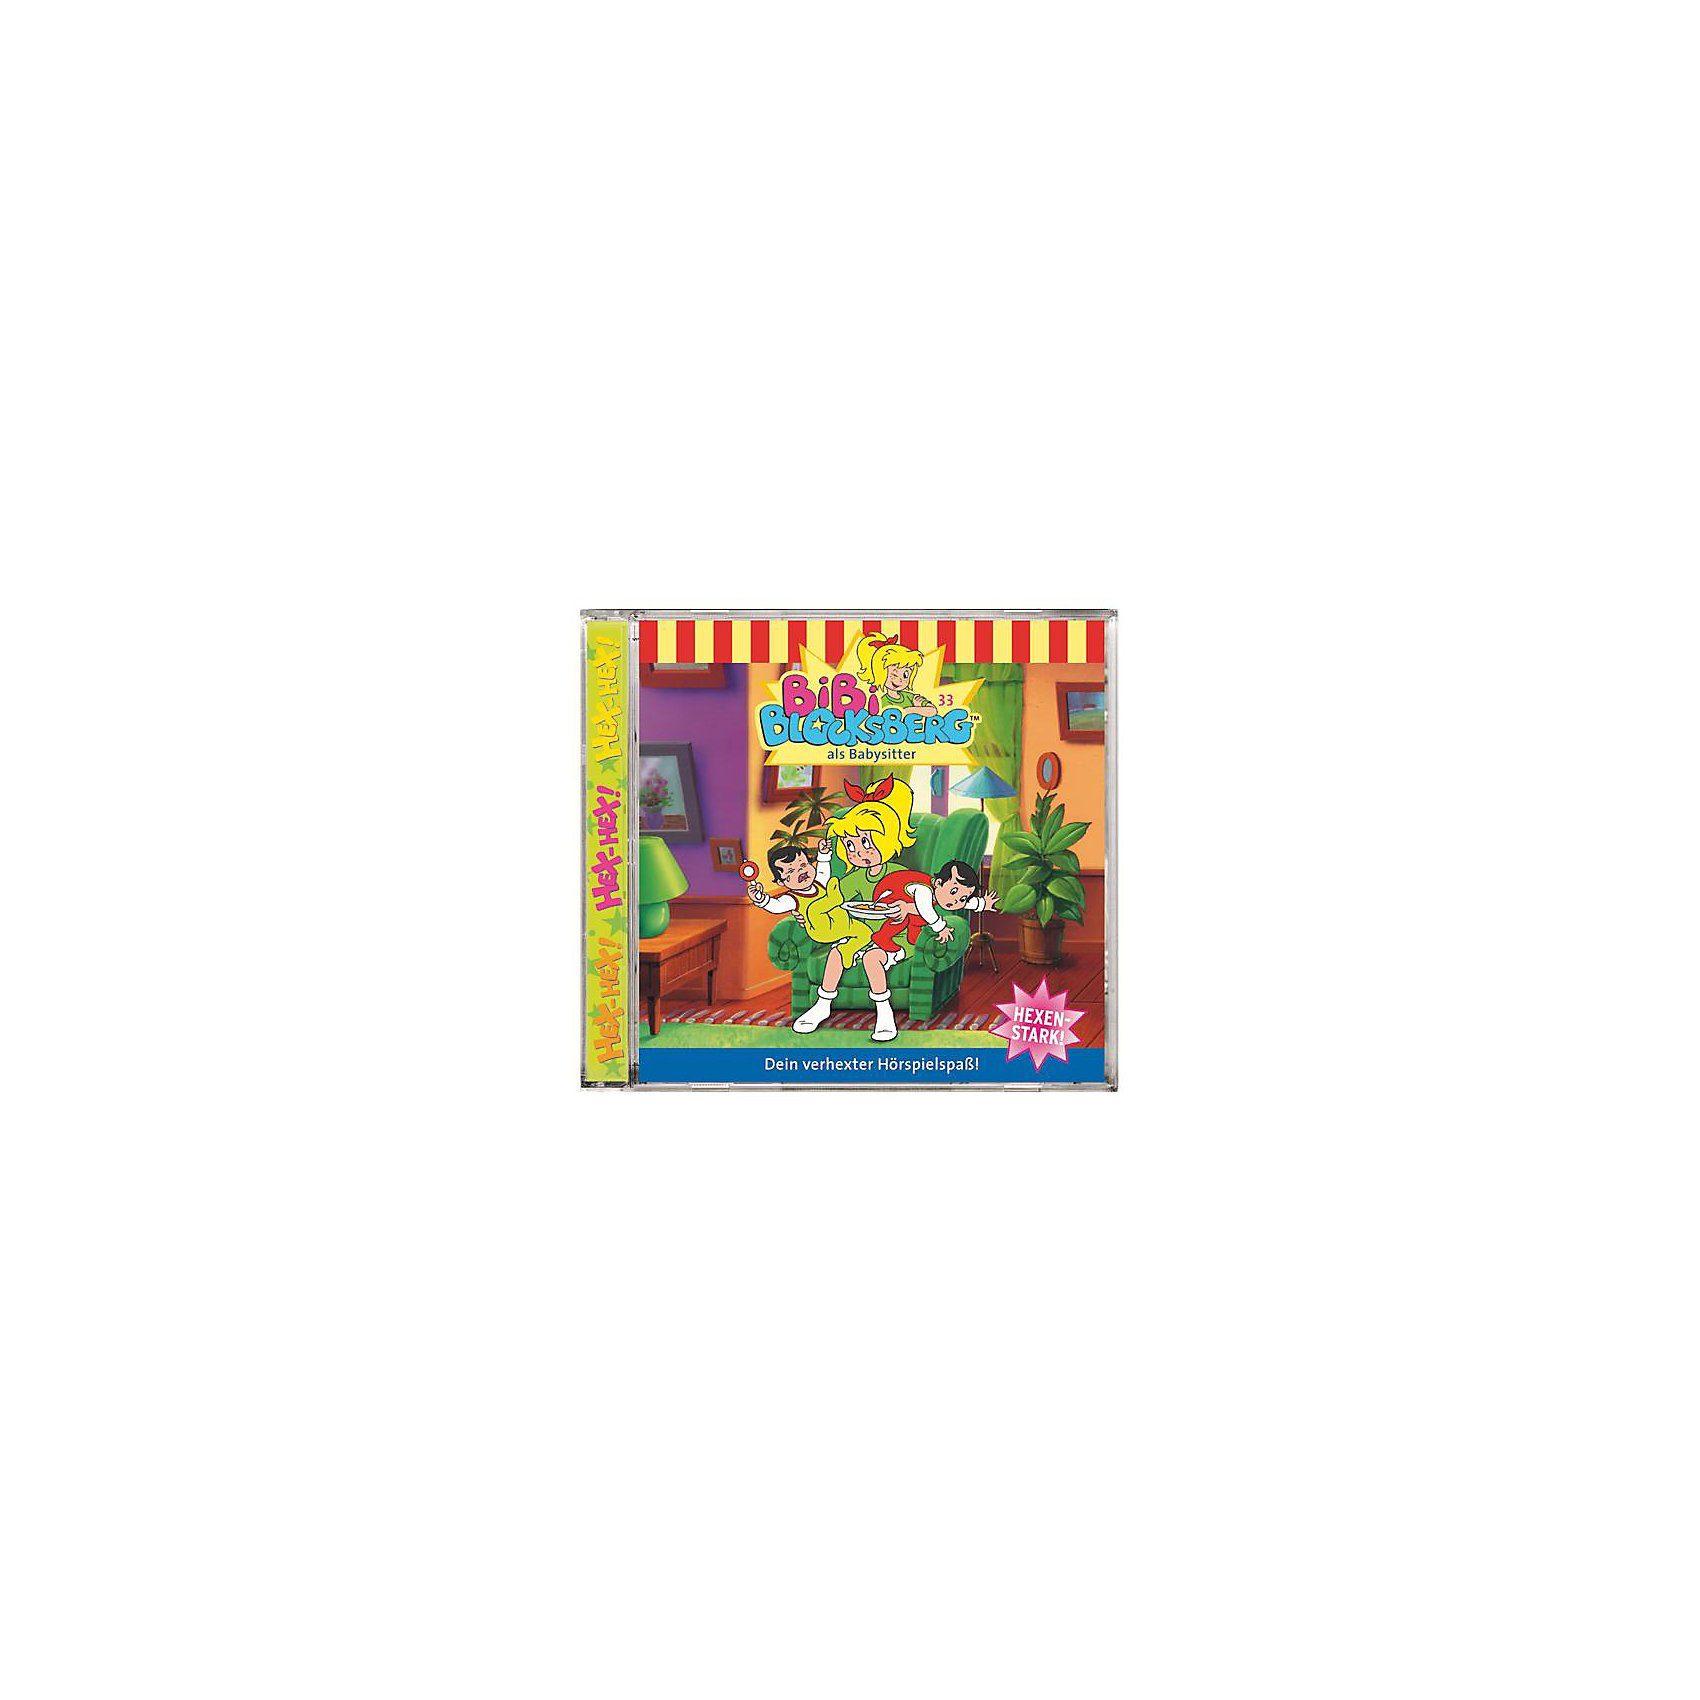 Kiddinx CD Bibi Blocksberg 33 (als Babysitter)